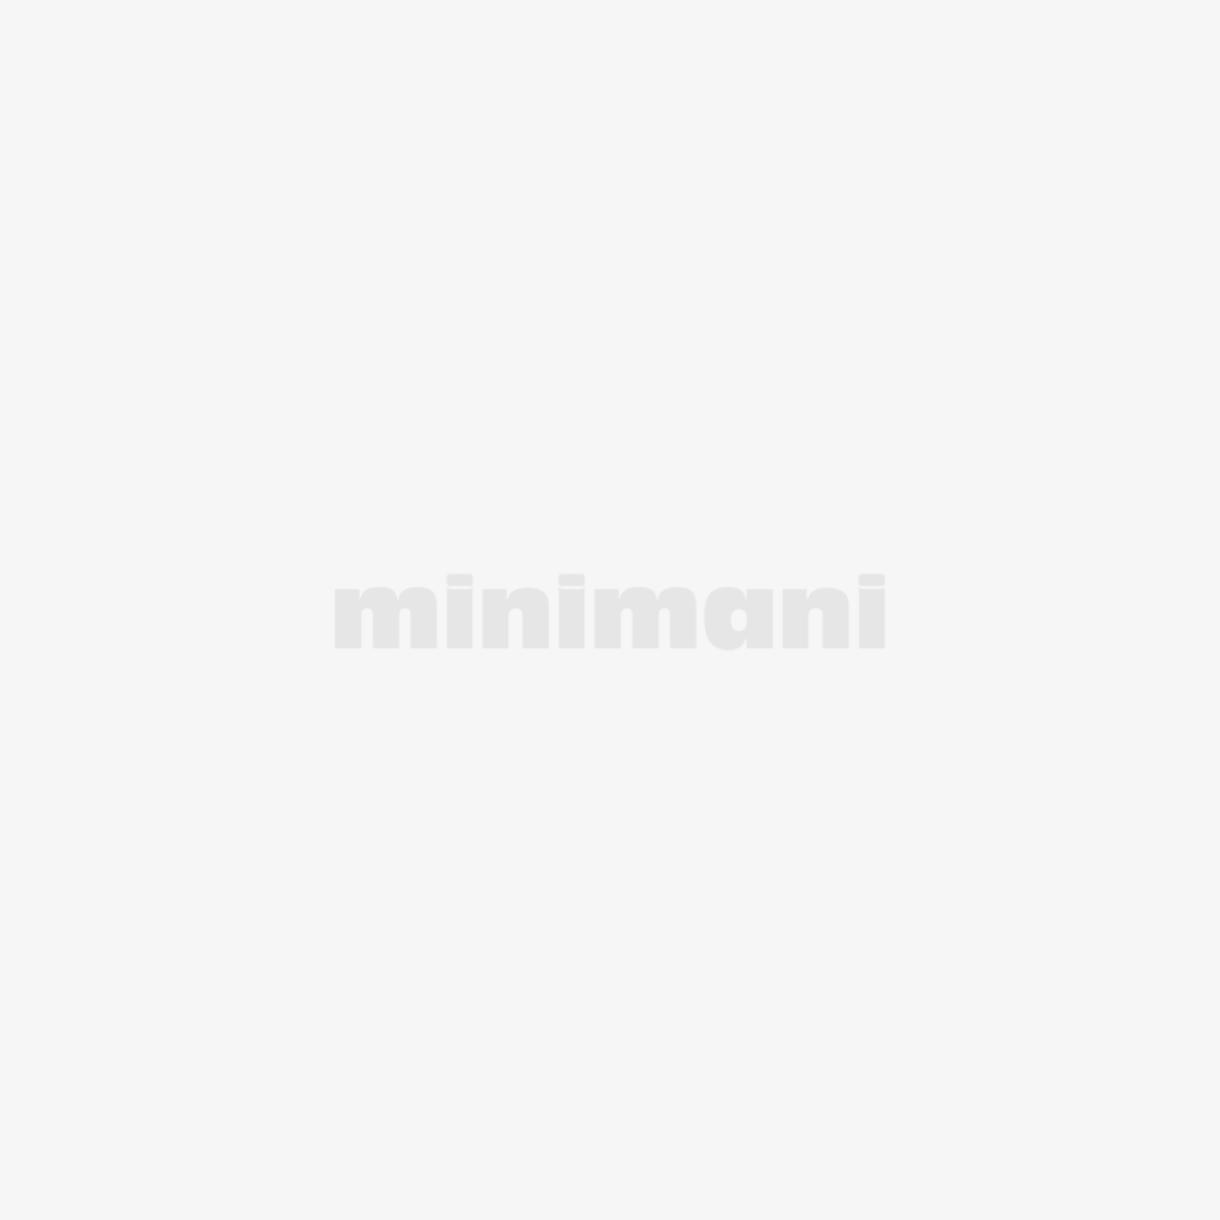 FINNWEAR PLUS NAISTEN PITKIKSET, OONA, PLUS XL 1210 SORT